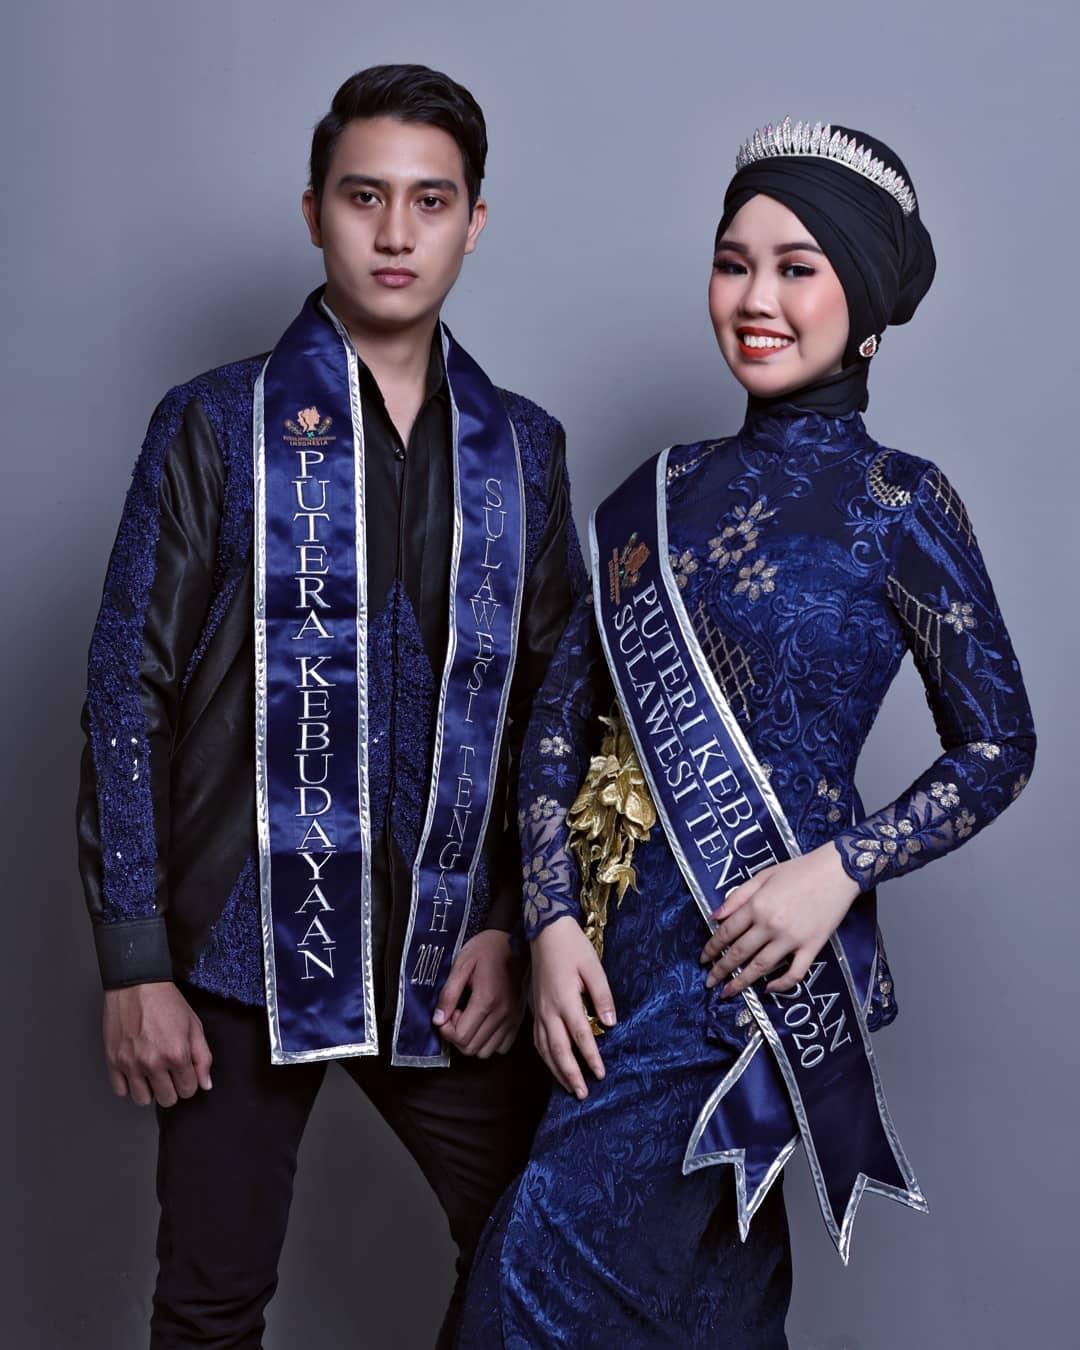 Mengenal-Lebih-Dekat-Wibie-Tahtanu-Syarif-dan-Nana-Lamasitudju-Putera-Puteri-Kebudayaan-Indonesia-Sulawesi-Tengah-2020